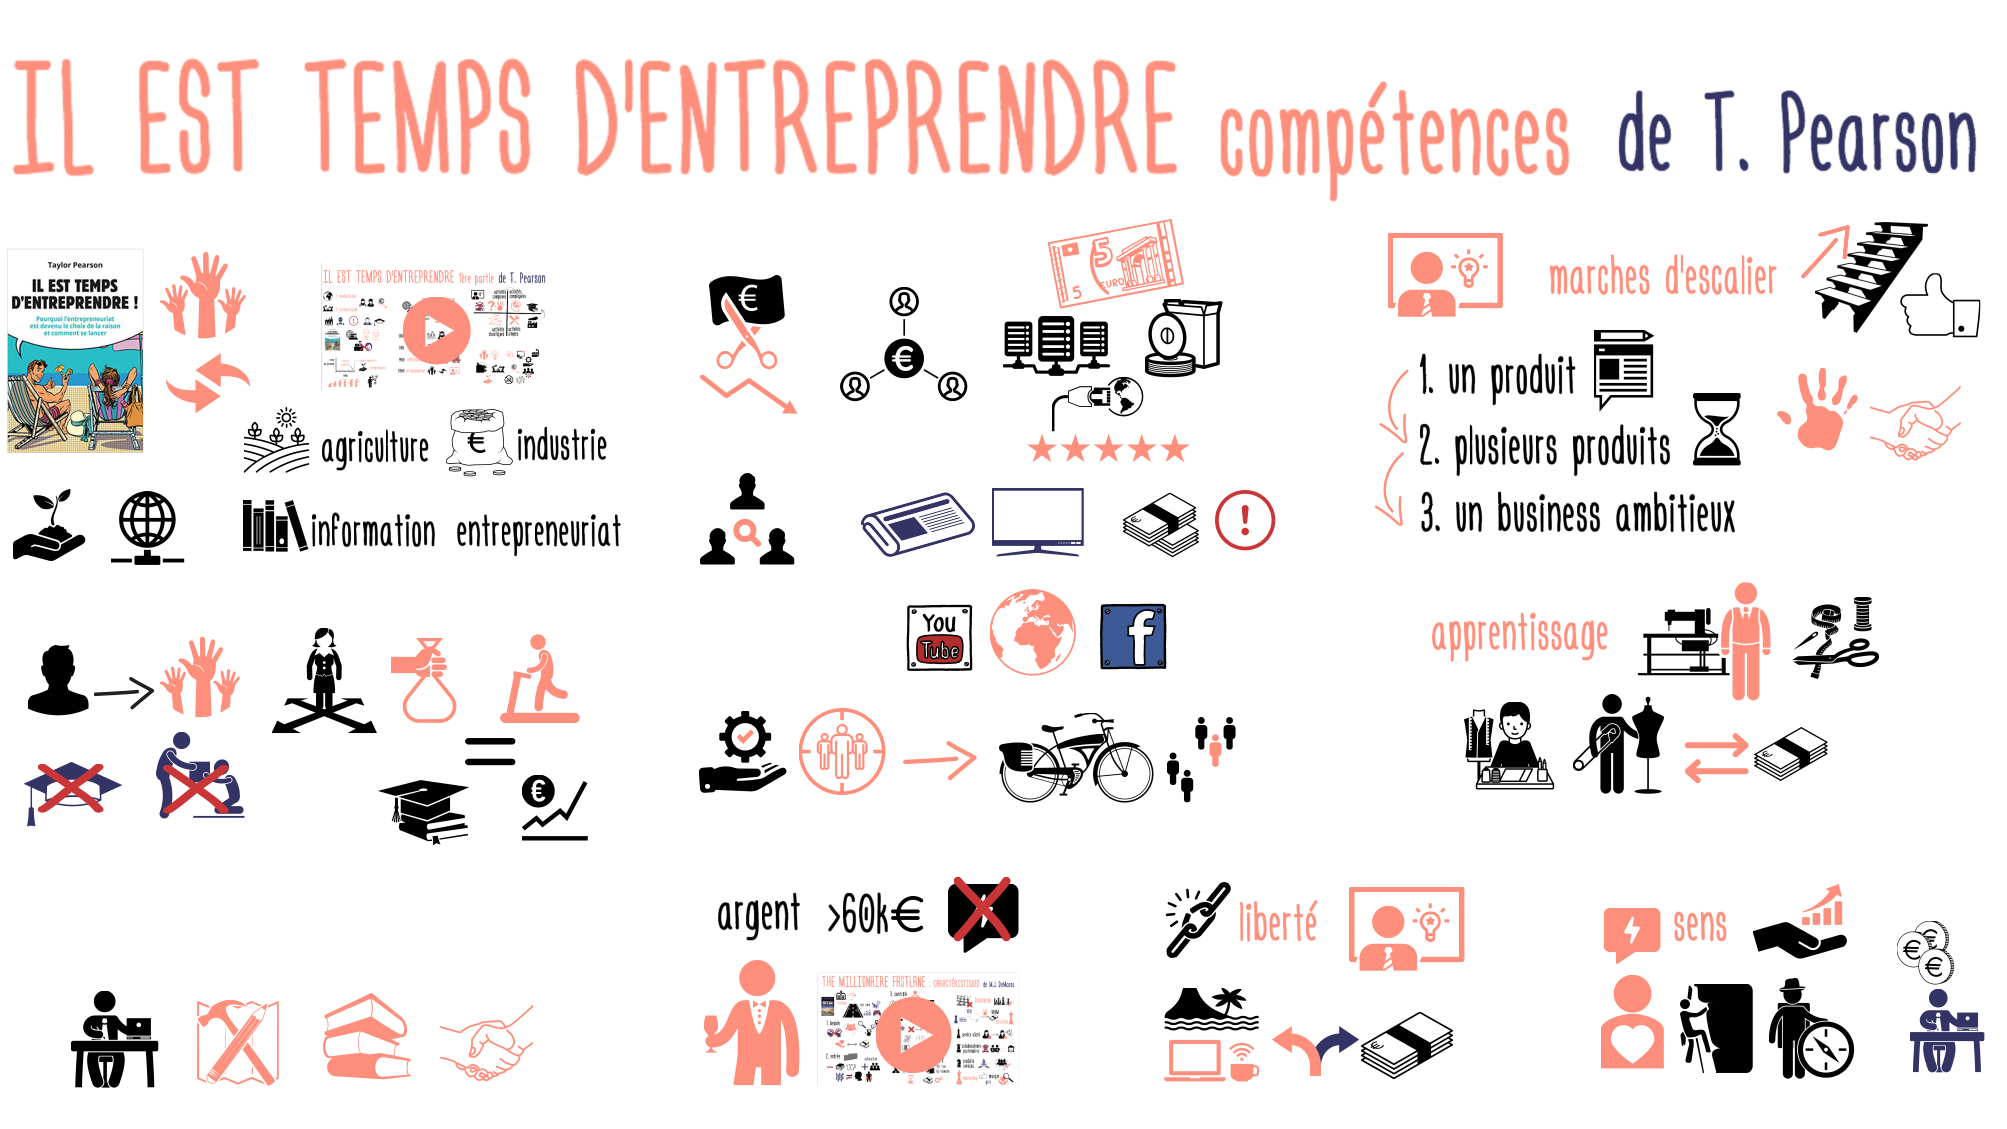 TempsDEntreprendre_Competences